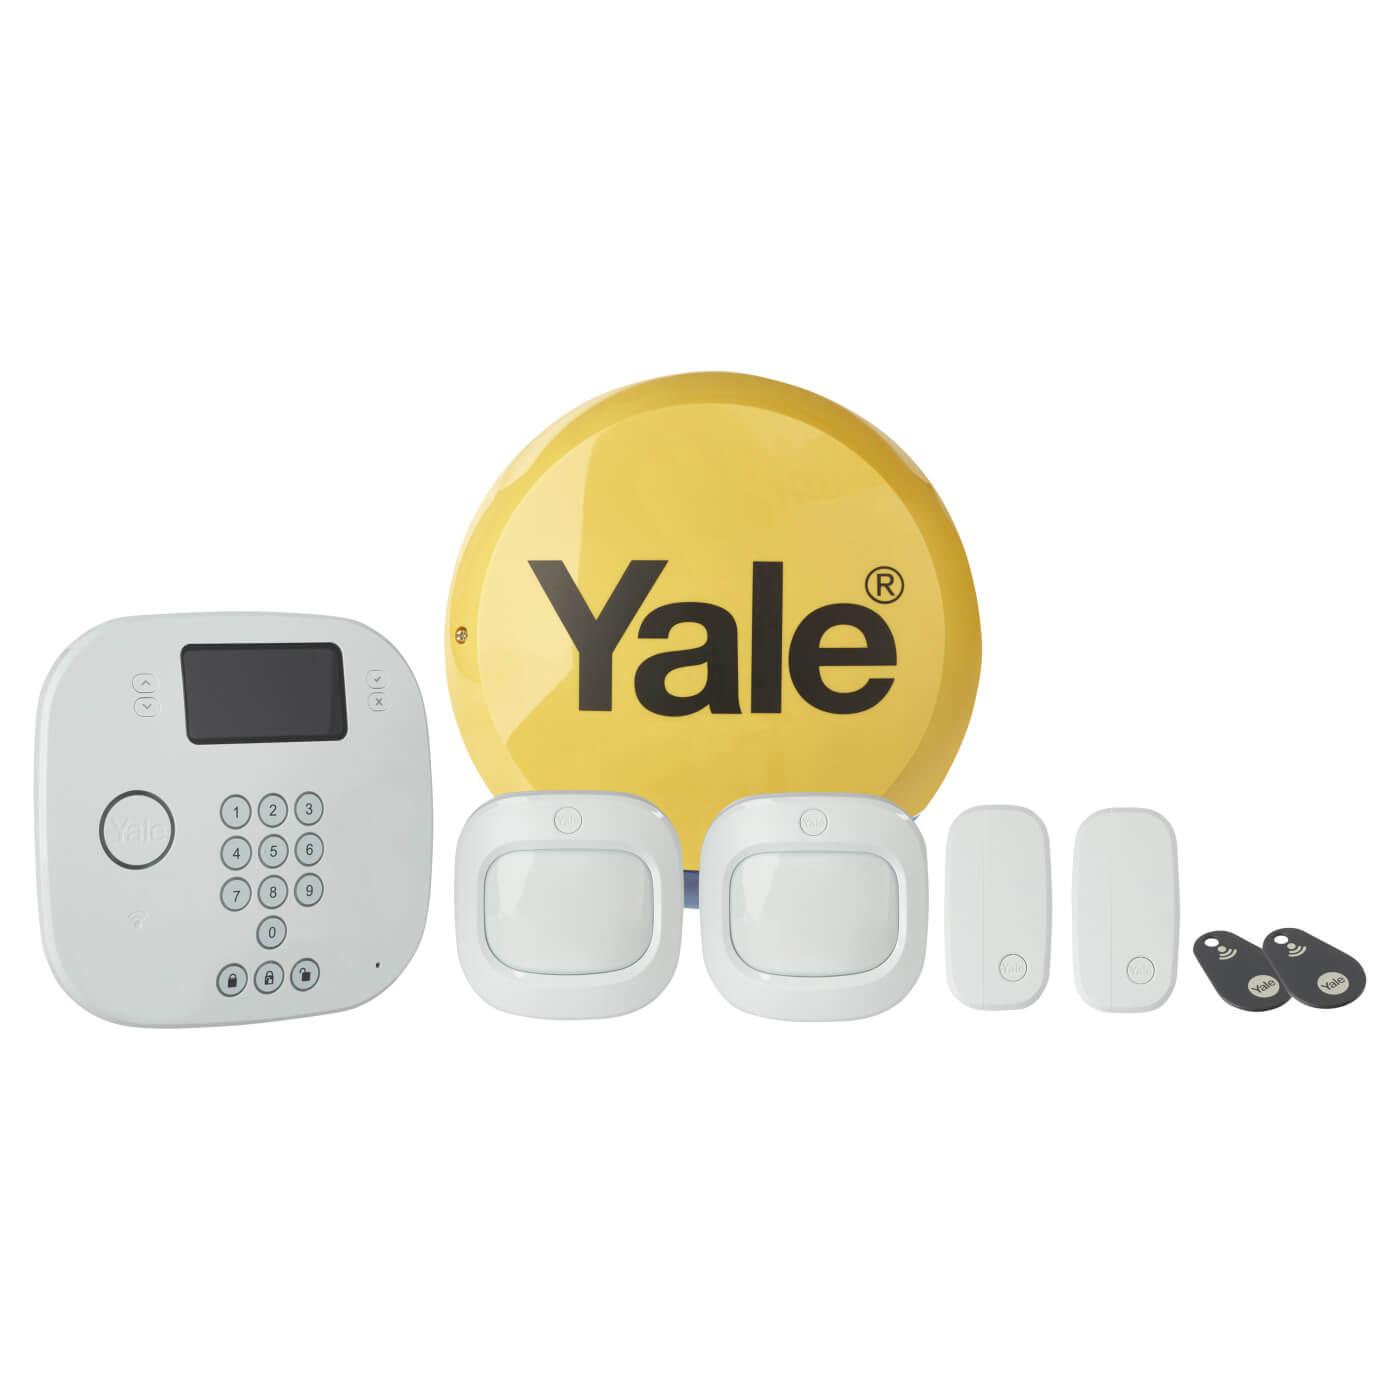 Yale Intruder Alarm Kit (IA-220)